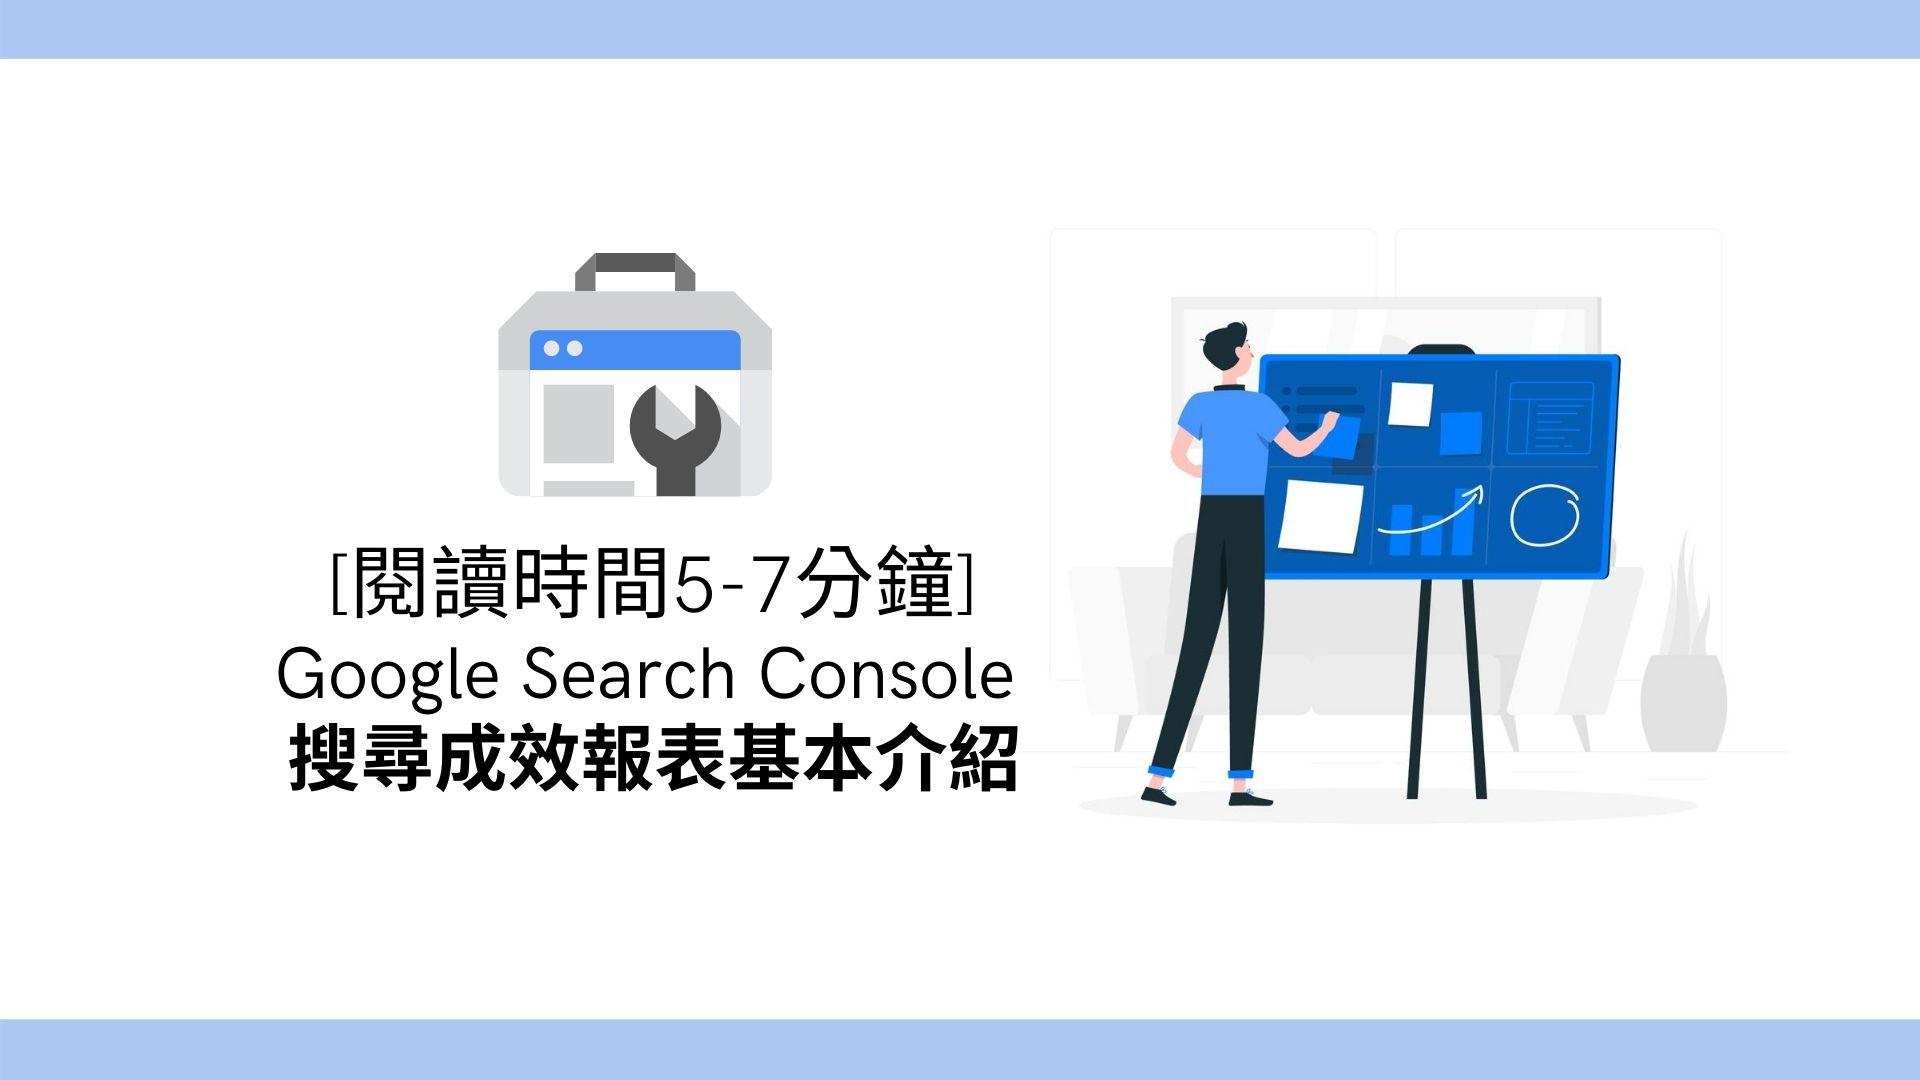 Google Search Console – 搜尋成效報表基本介紹